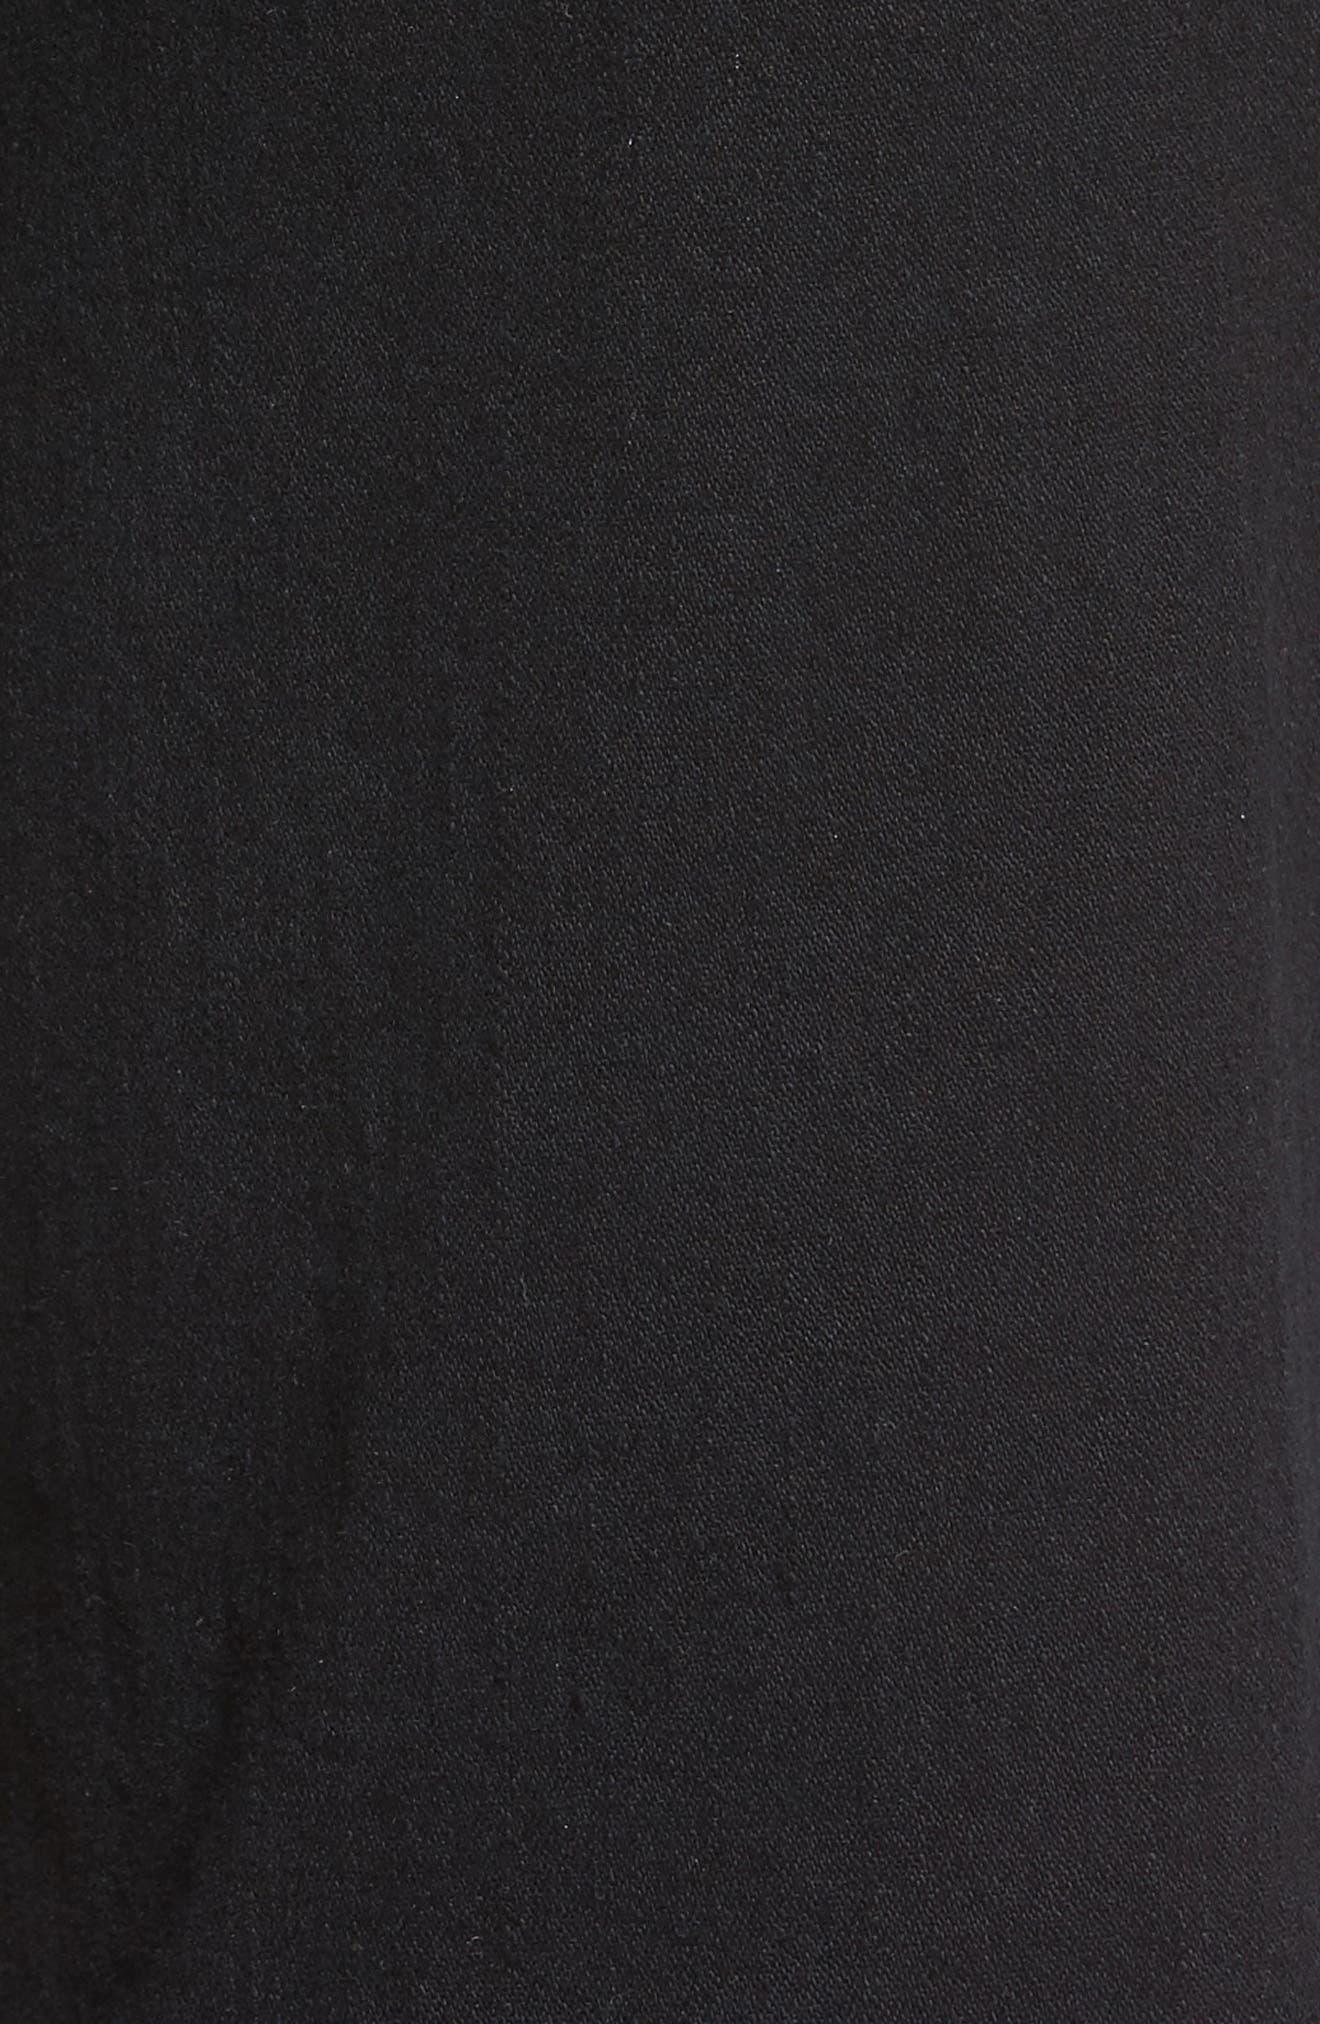 NYDJ,                             Marilyn High Waist Stretch Straight Leg Jeans,                             Alternate thumbnail 5, color,                             BLACK